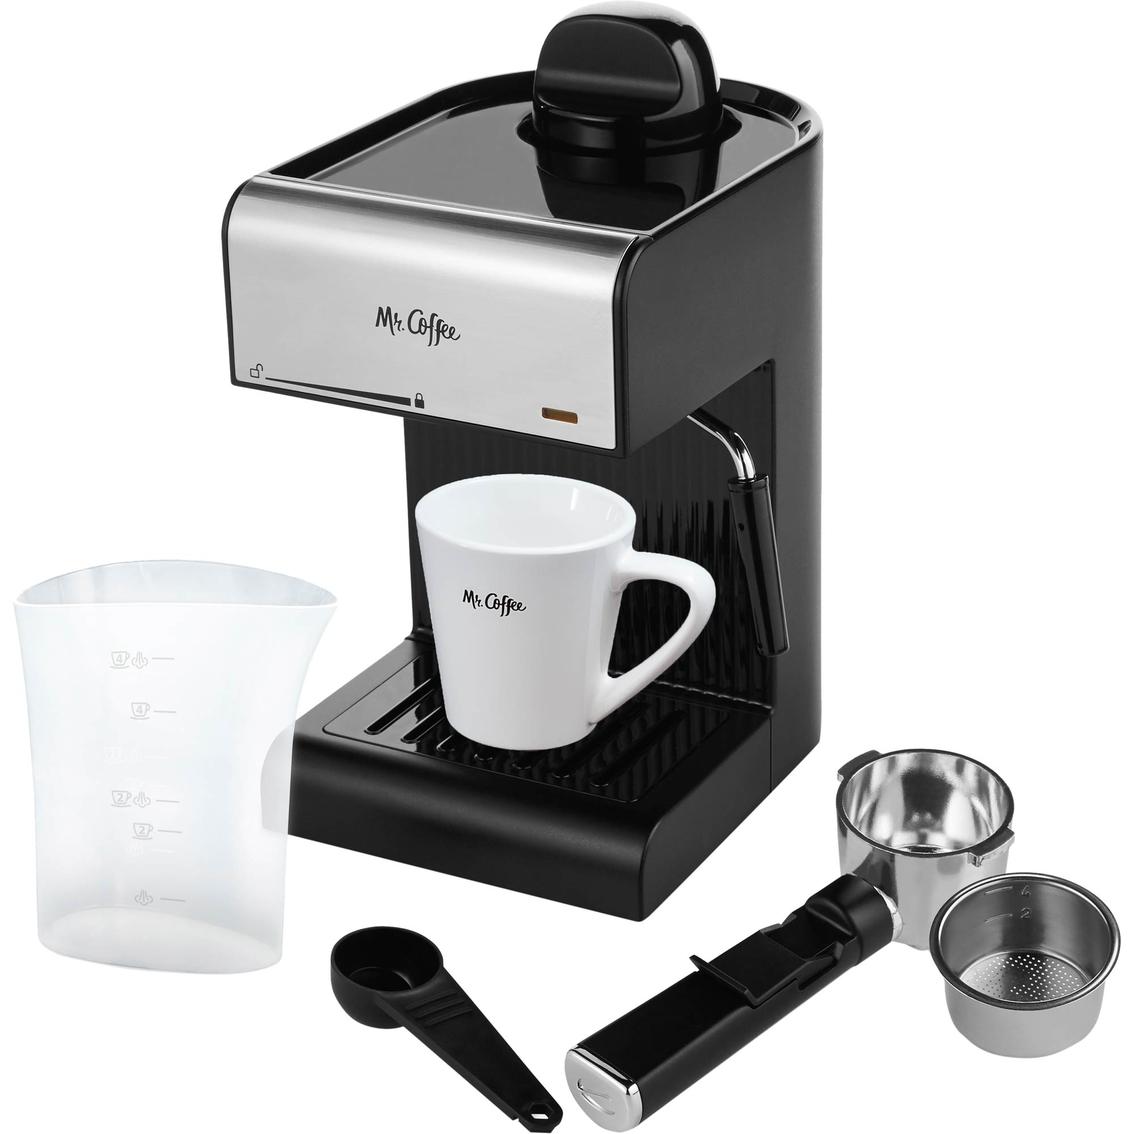 Mr Coffee Cafe 20 Oz Steam Automatic